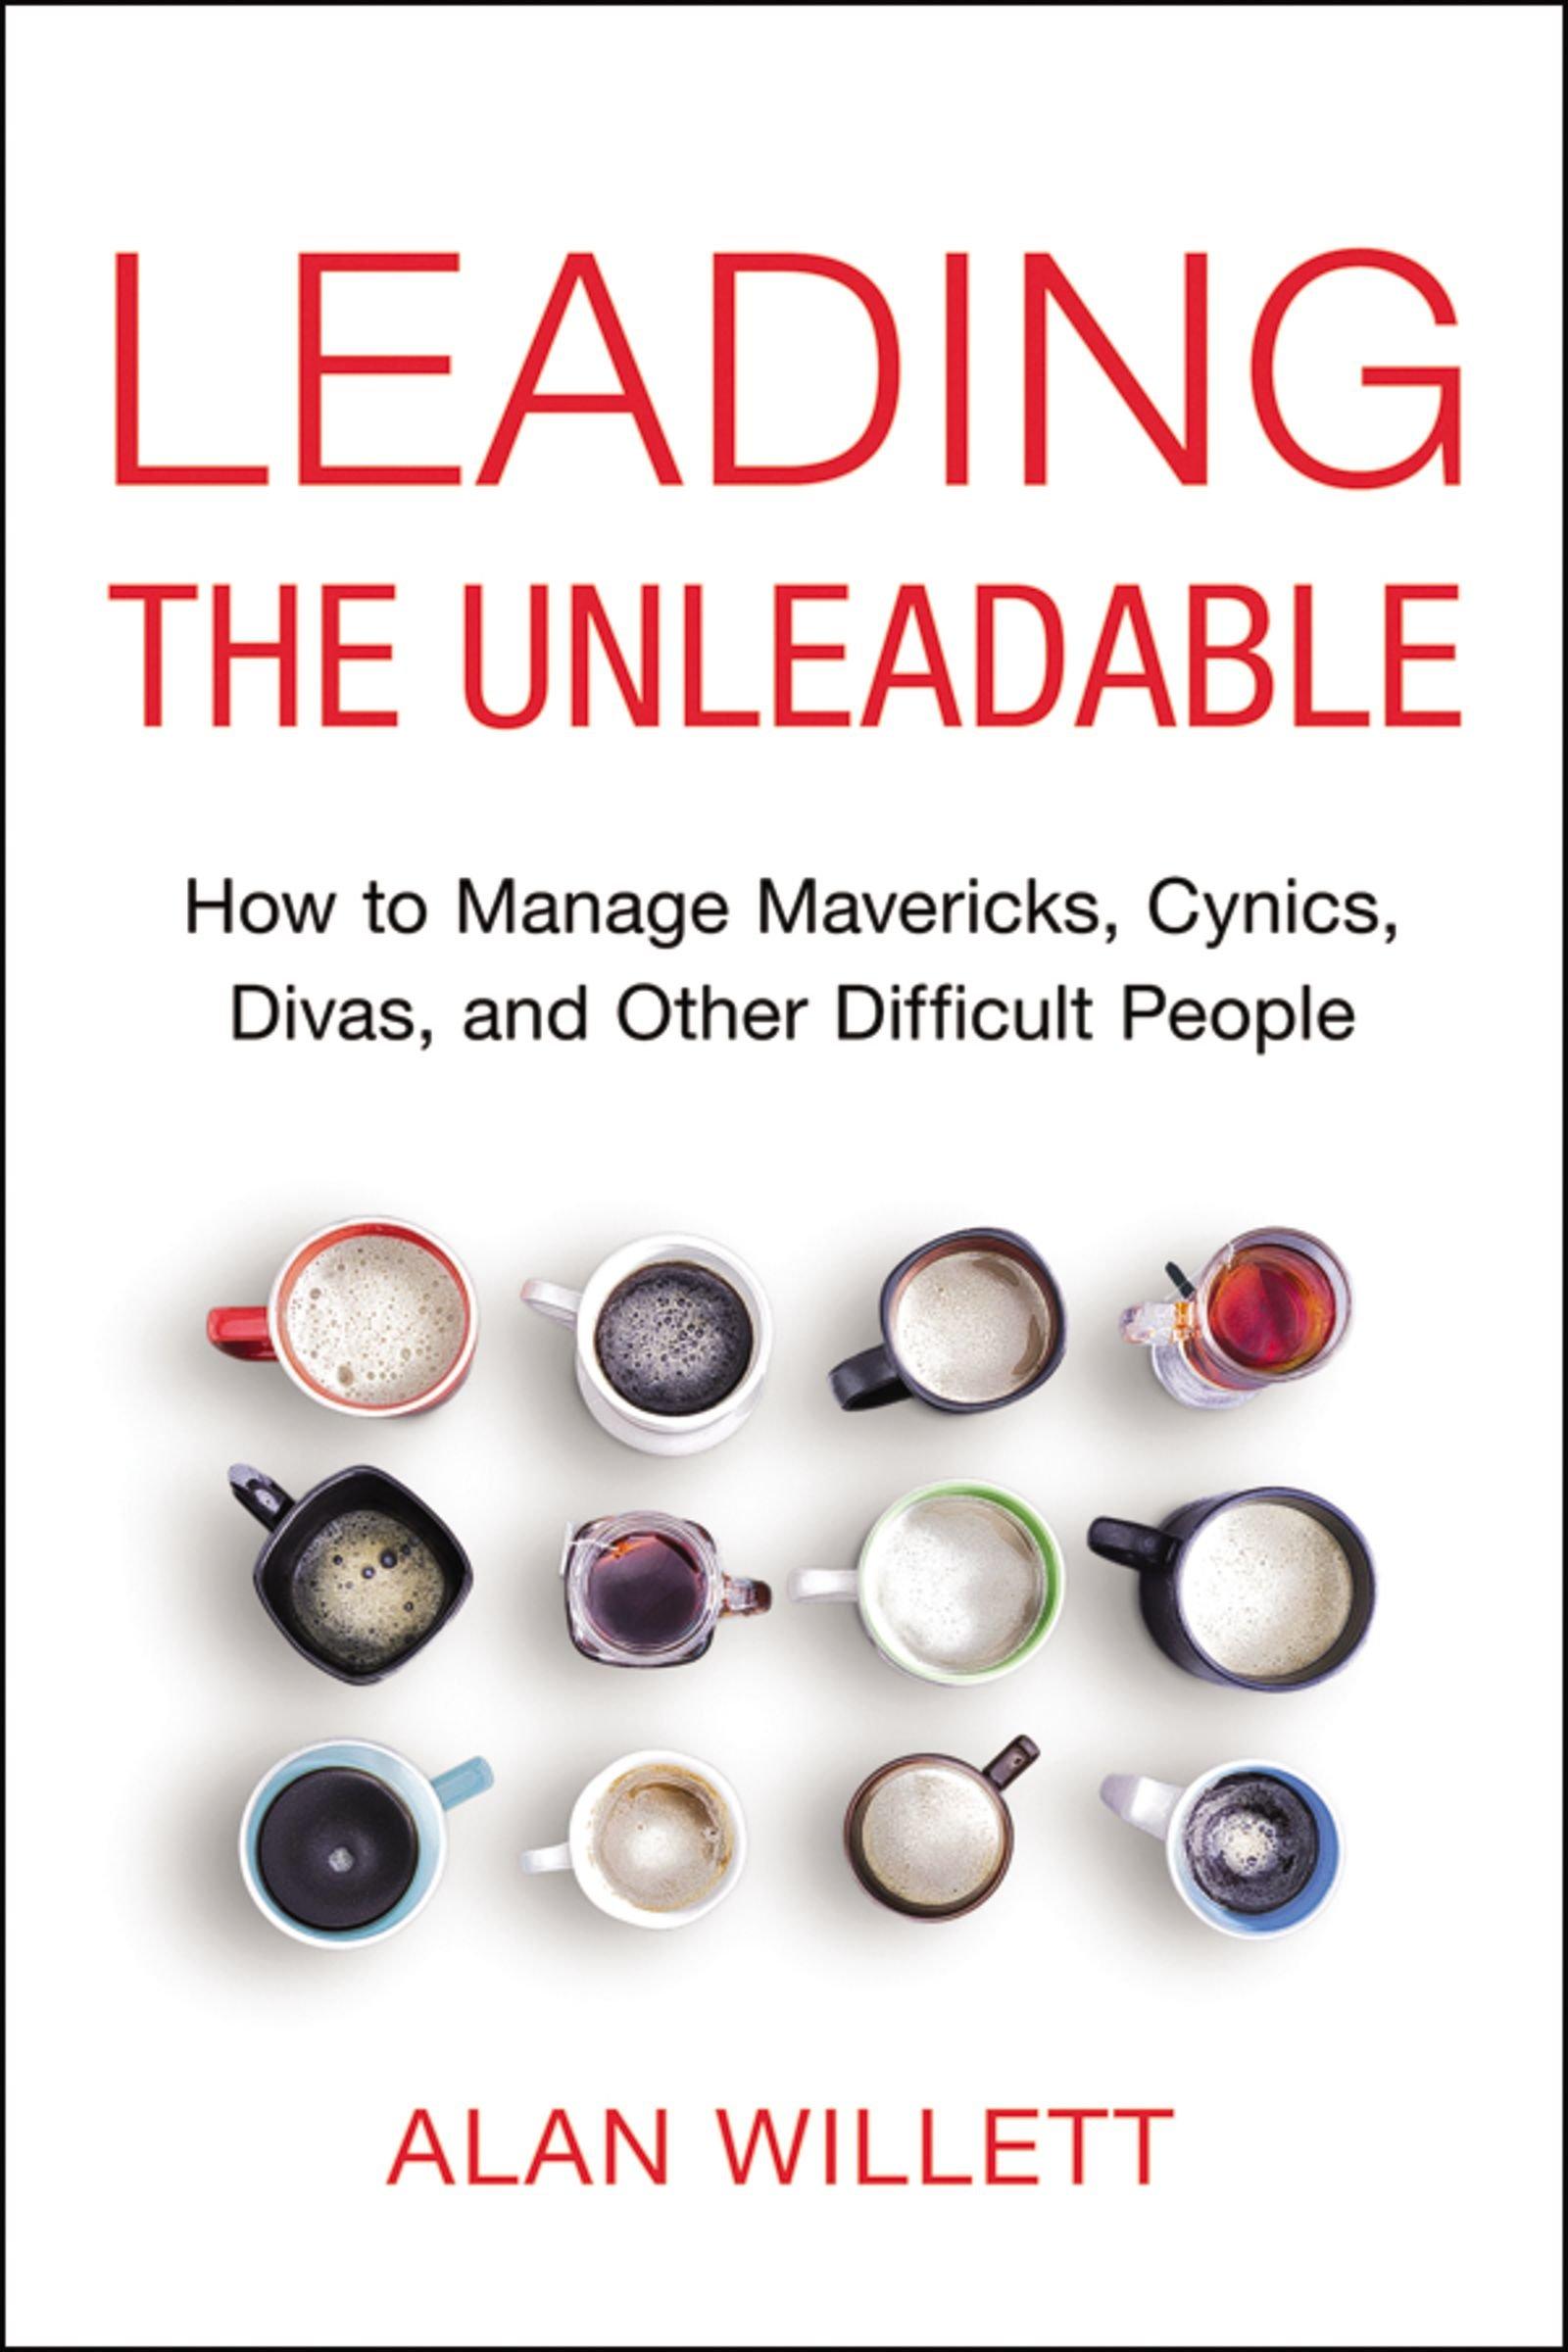 Leading the Unleadable: How to Manage Mavericks, Cynics, Divas, and ...